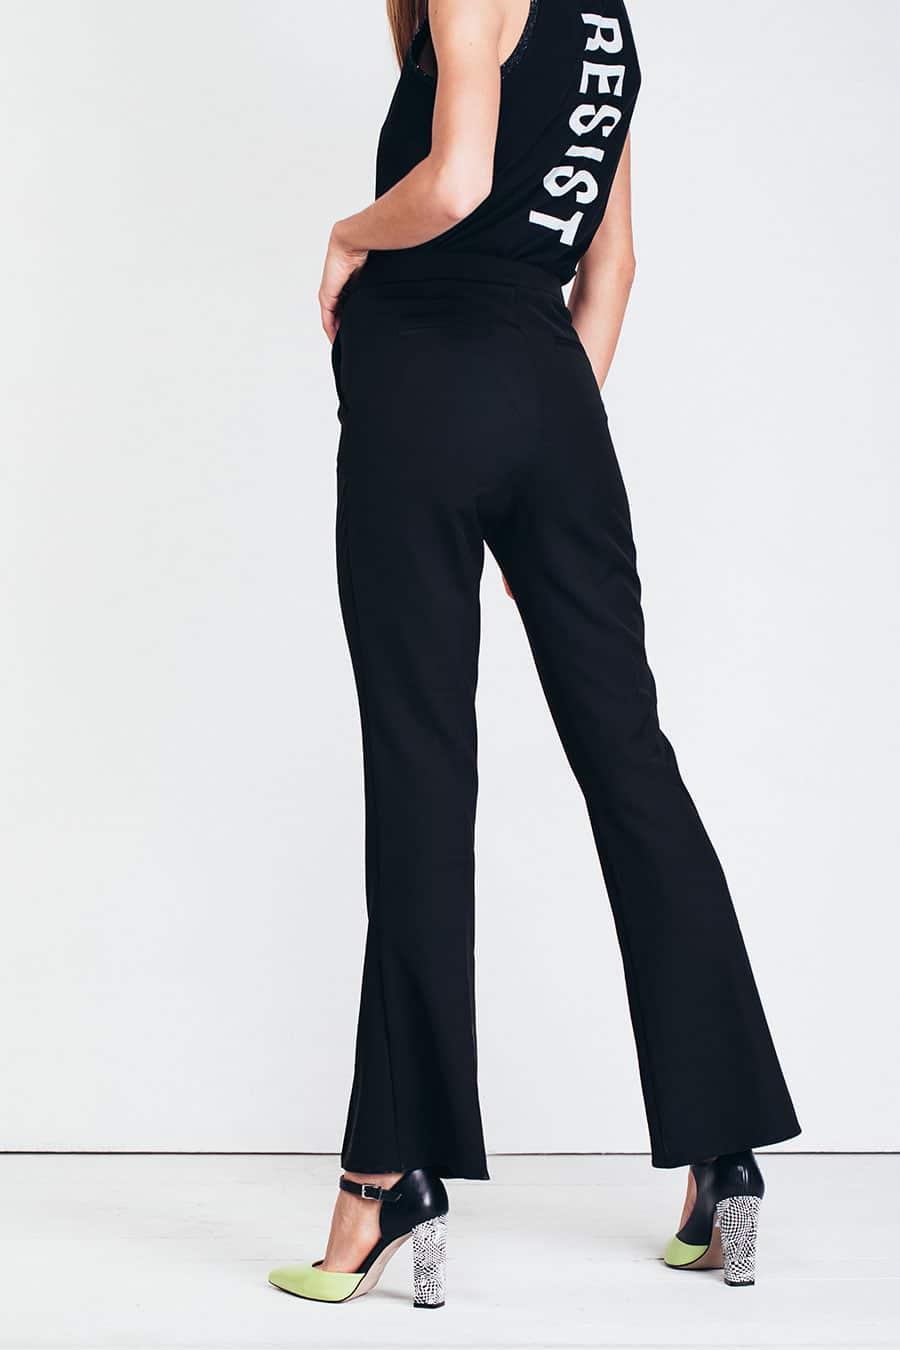 jagger internet prodavnica kolekcija jesen zima 2021 zenske pantalone jg 1145 01 1